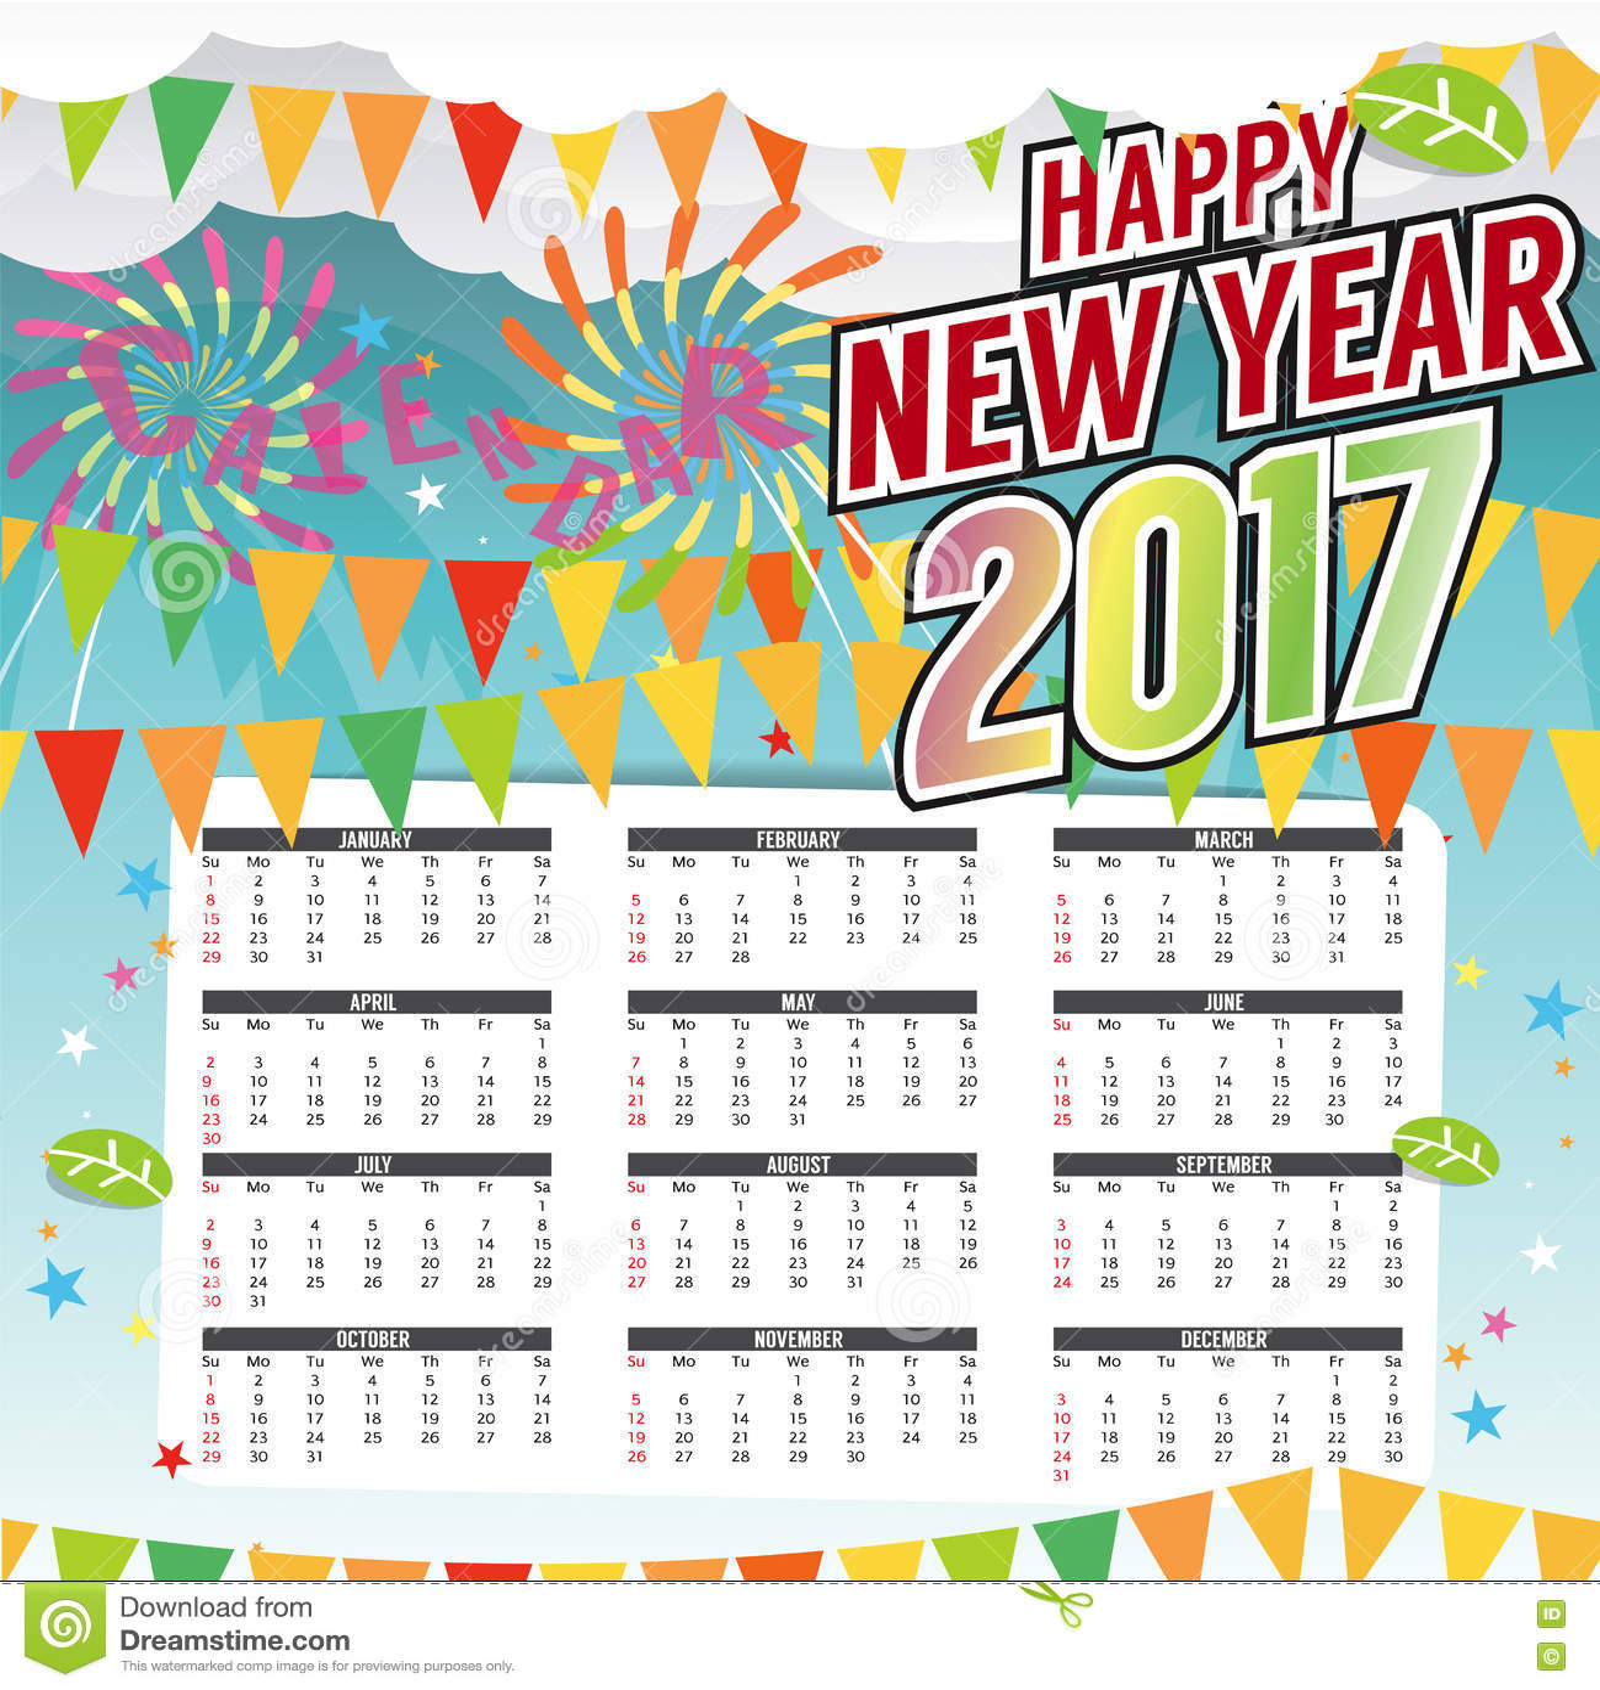 Happy New Year Calendar : Happy new year printable calendar starts sunday